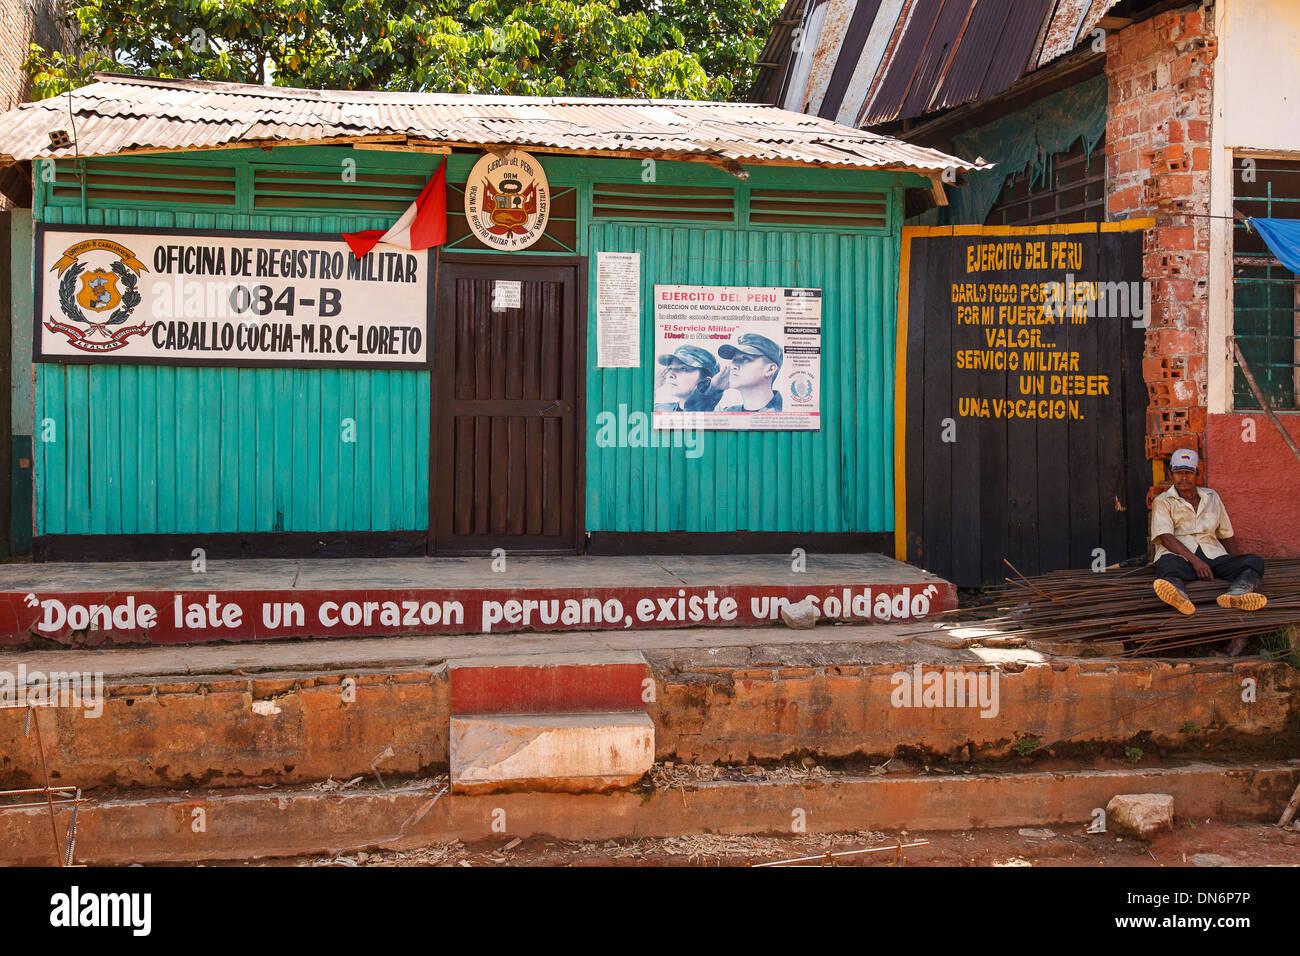 Military registration office, Caballococha, Amazonas river, Loreto, Peru - Stock Image